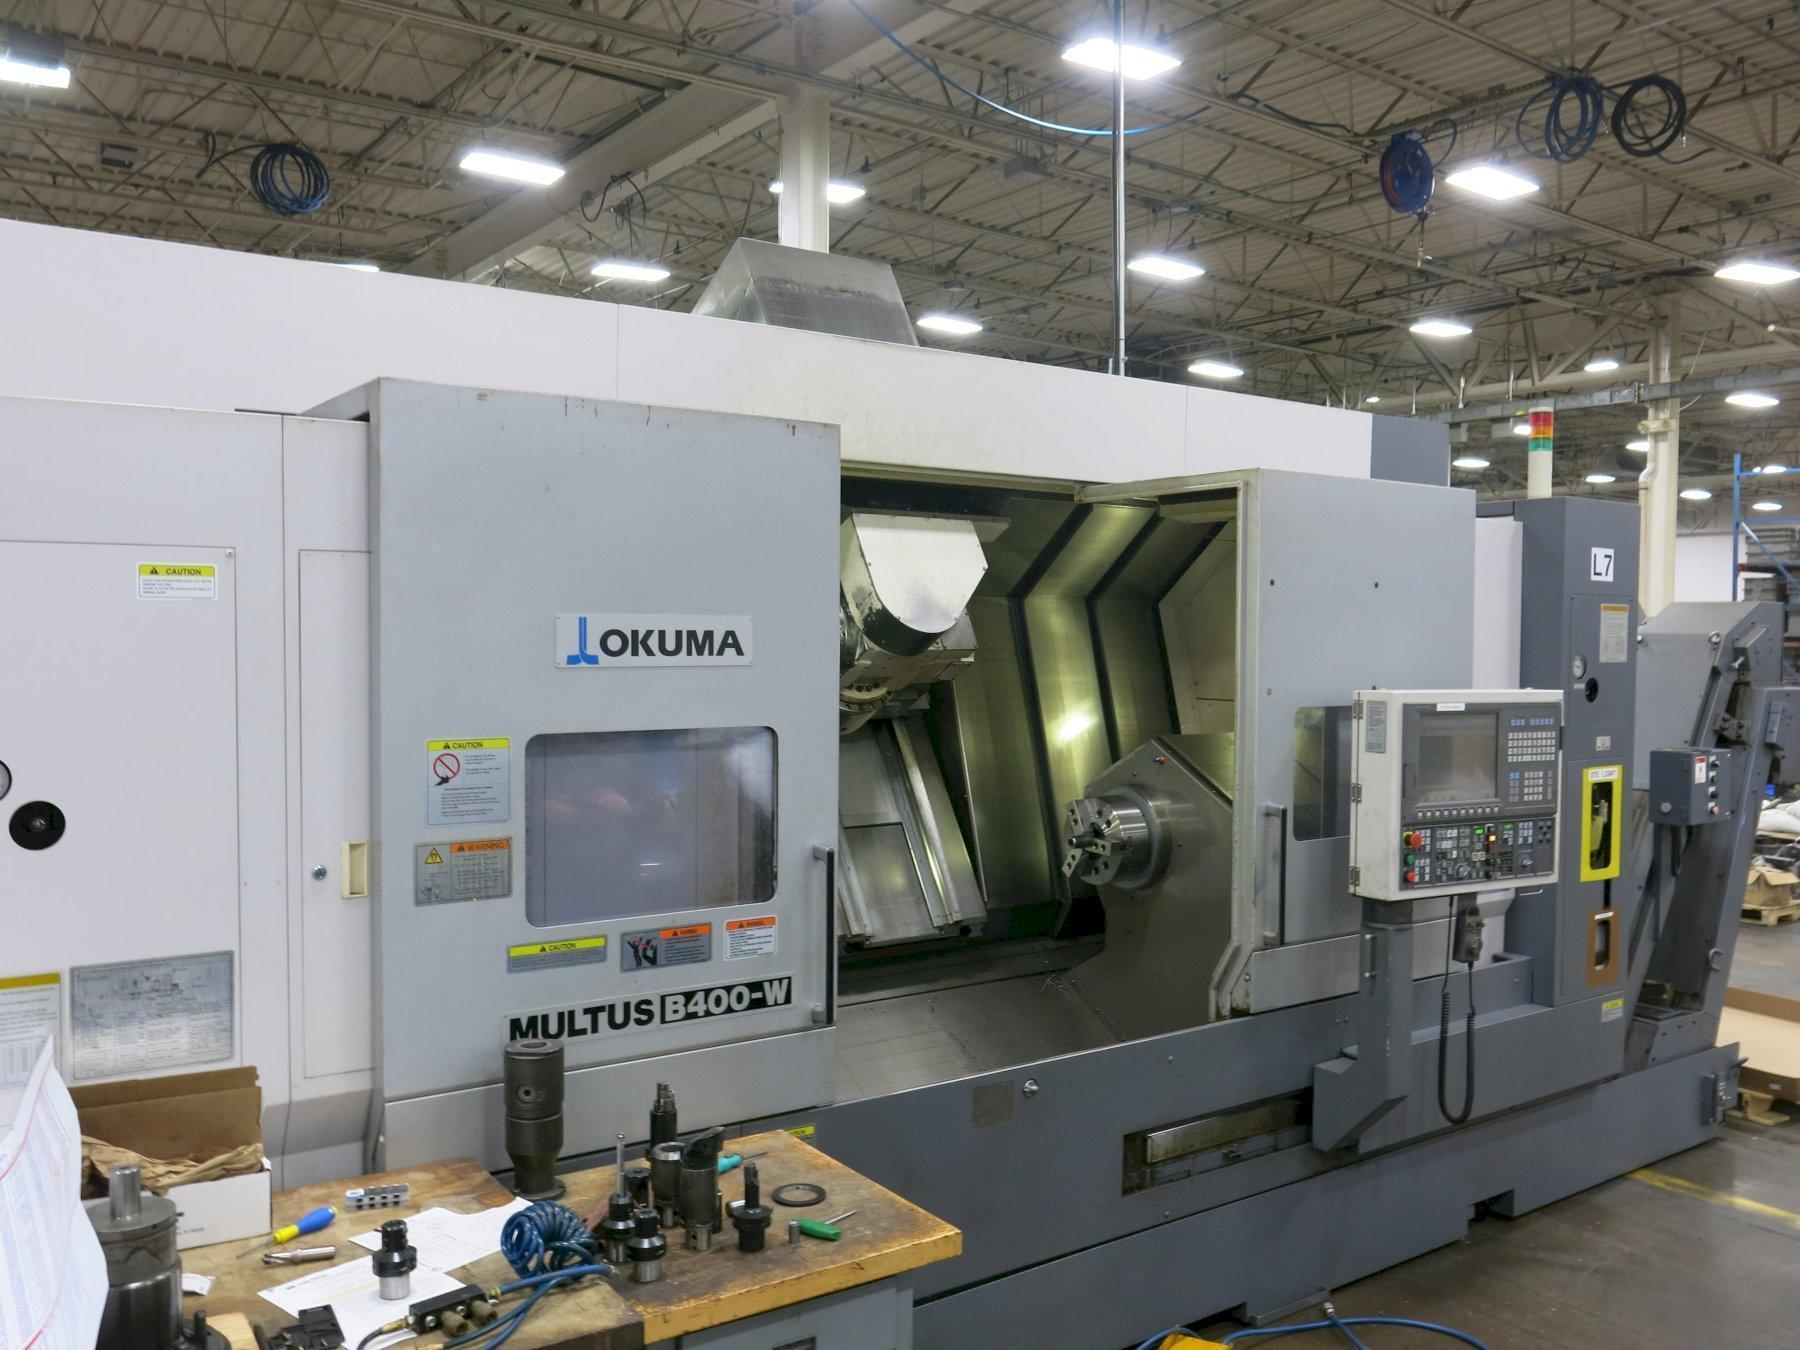 Okuma Multus B-400-W 1500 5-Axis Mill Turn CNC Lathe